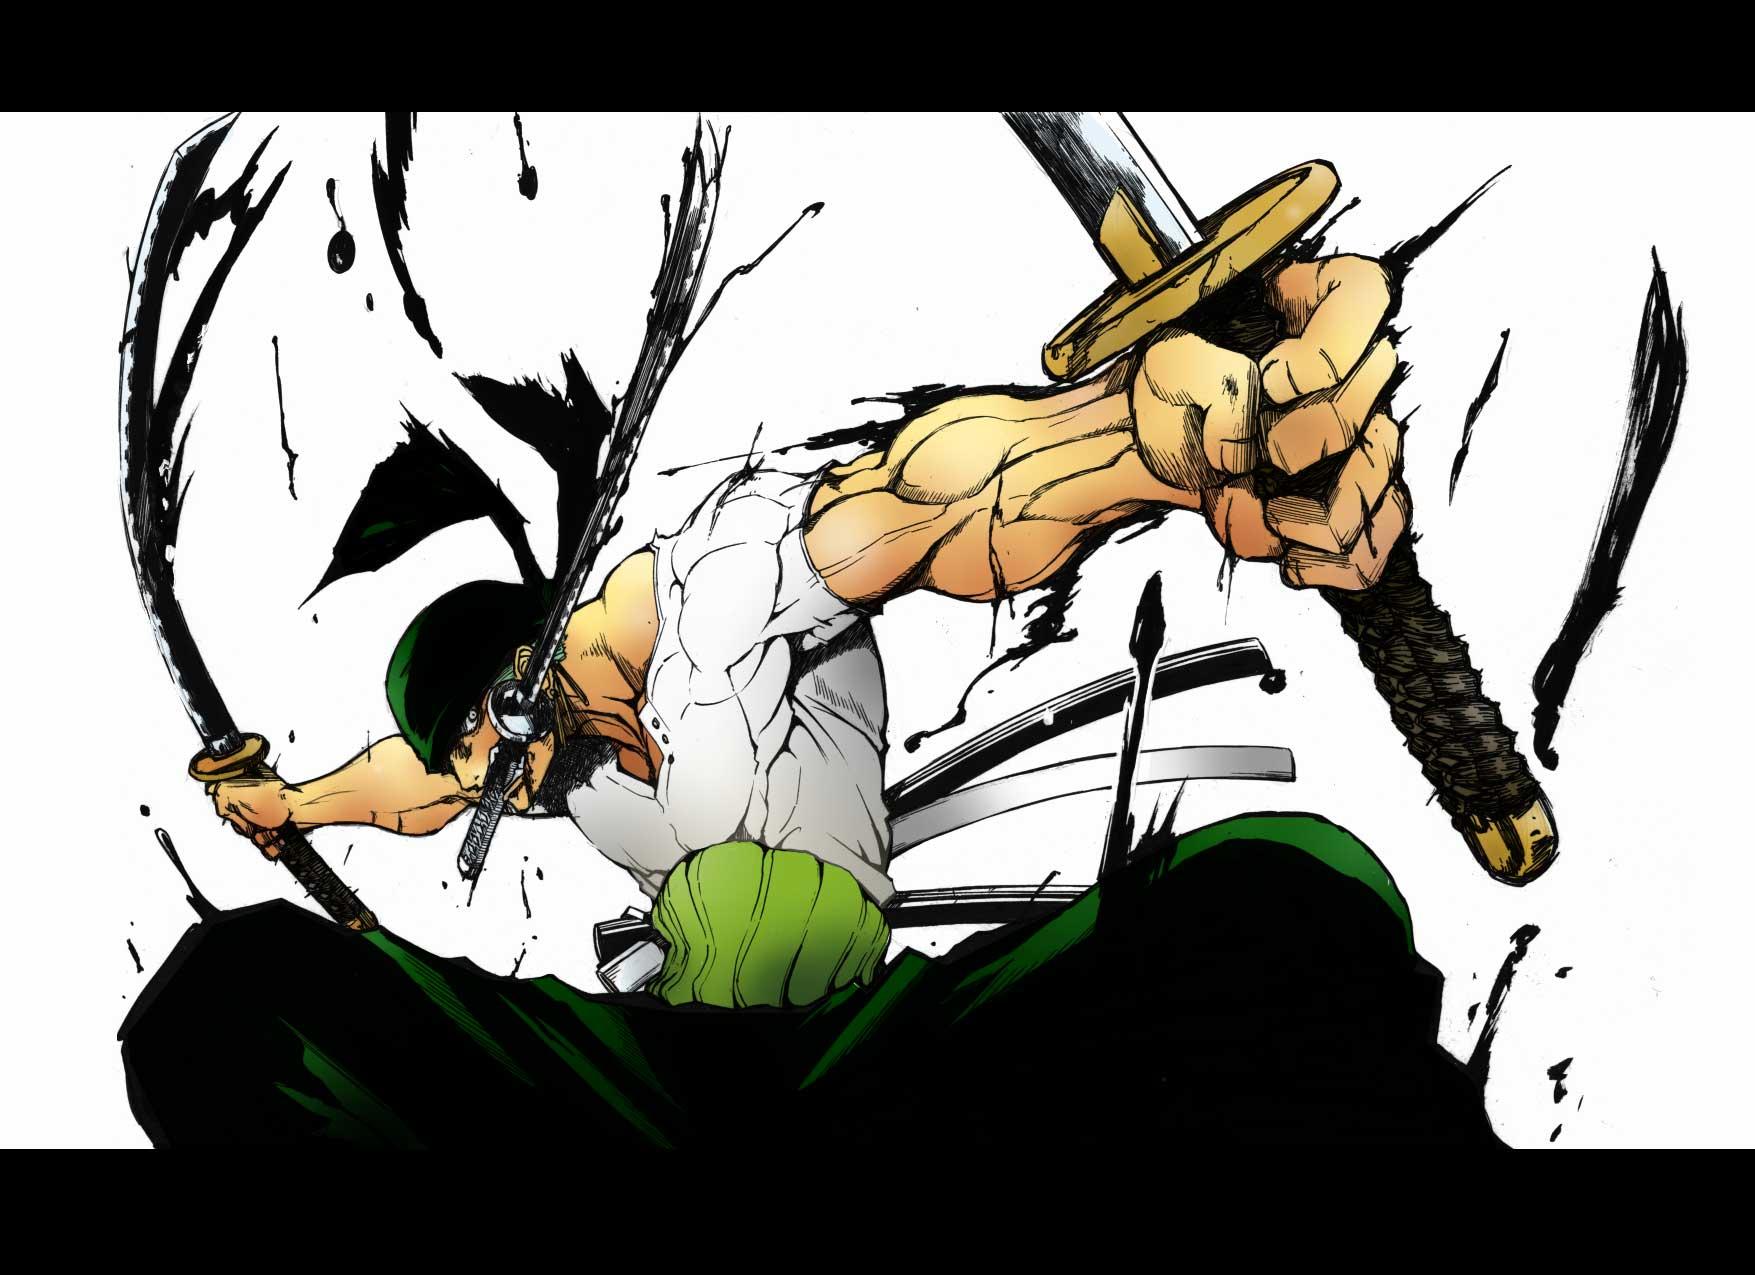 Whats Your Favorite Anime Swordsmanswordswoman